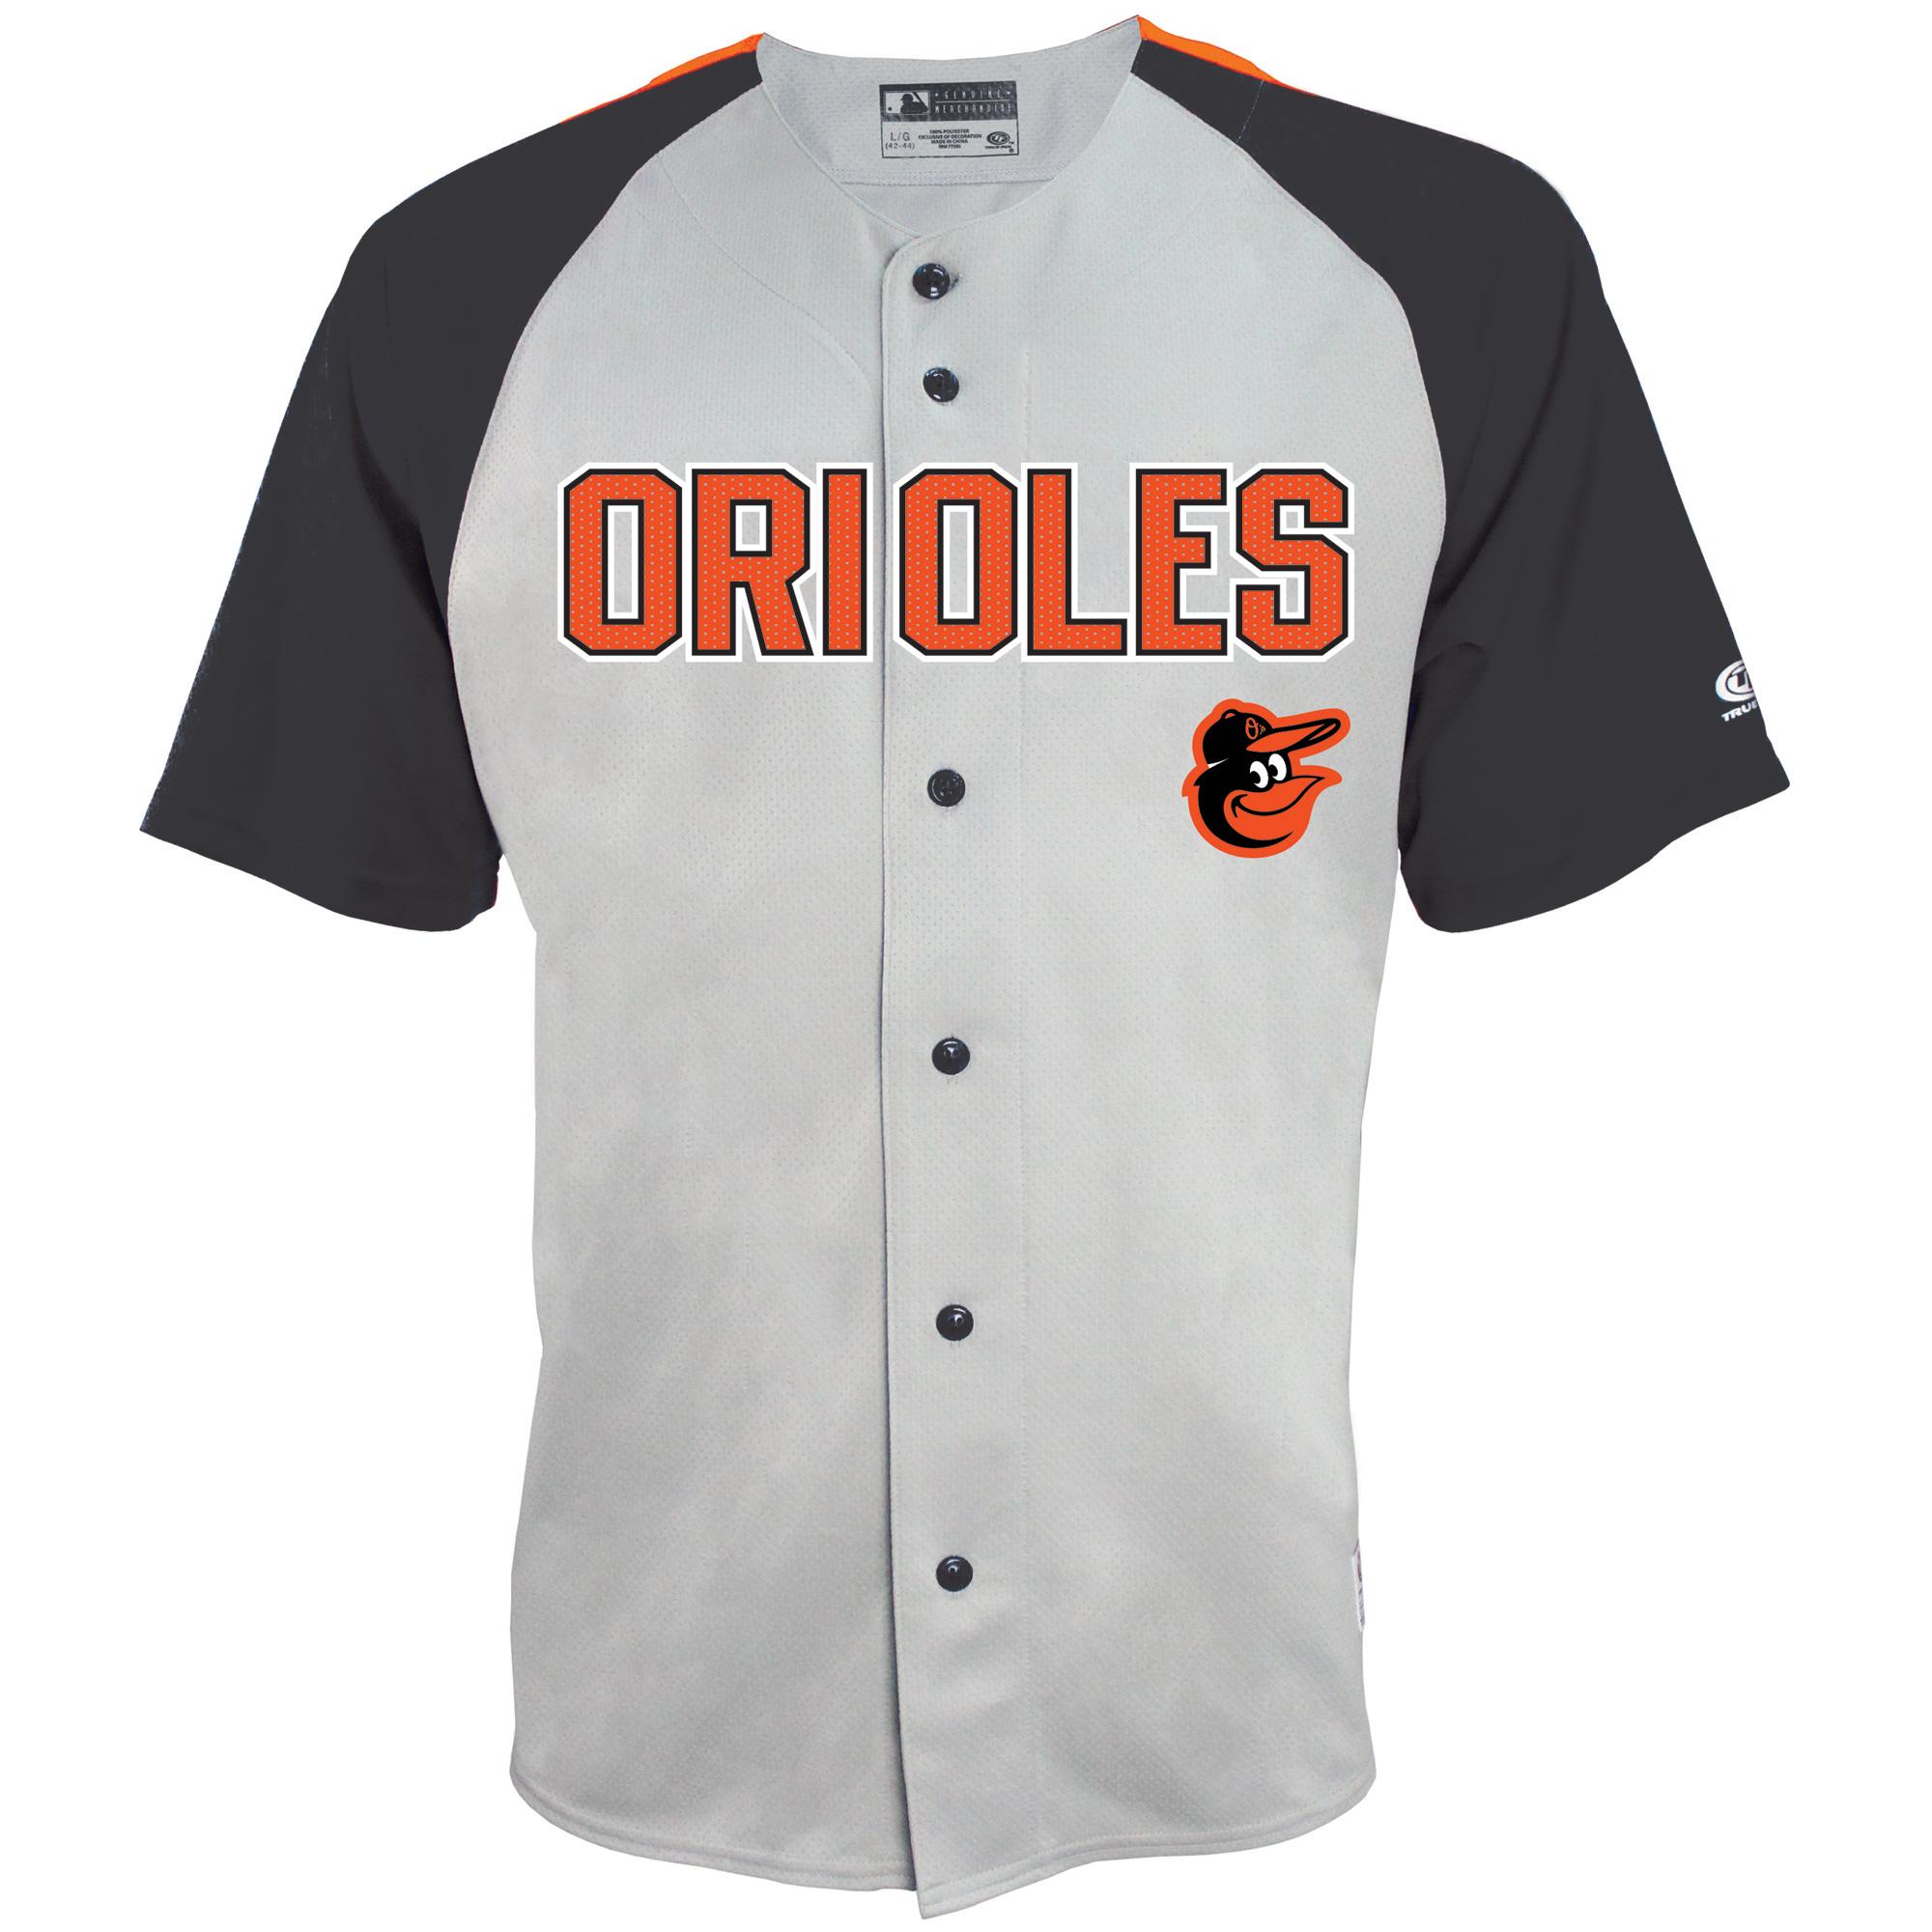 Baltimore Orioles Stitches Lightweight Mesh Jersey - Gray/Black